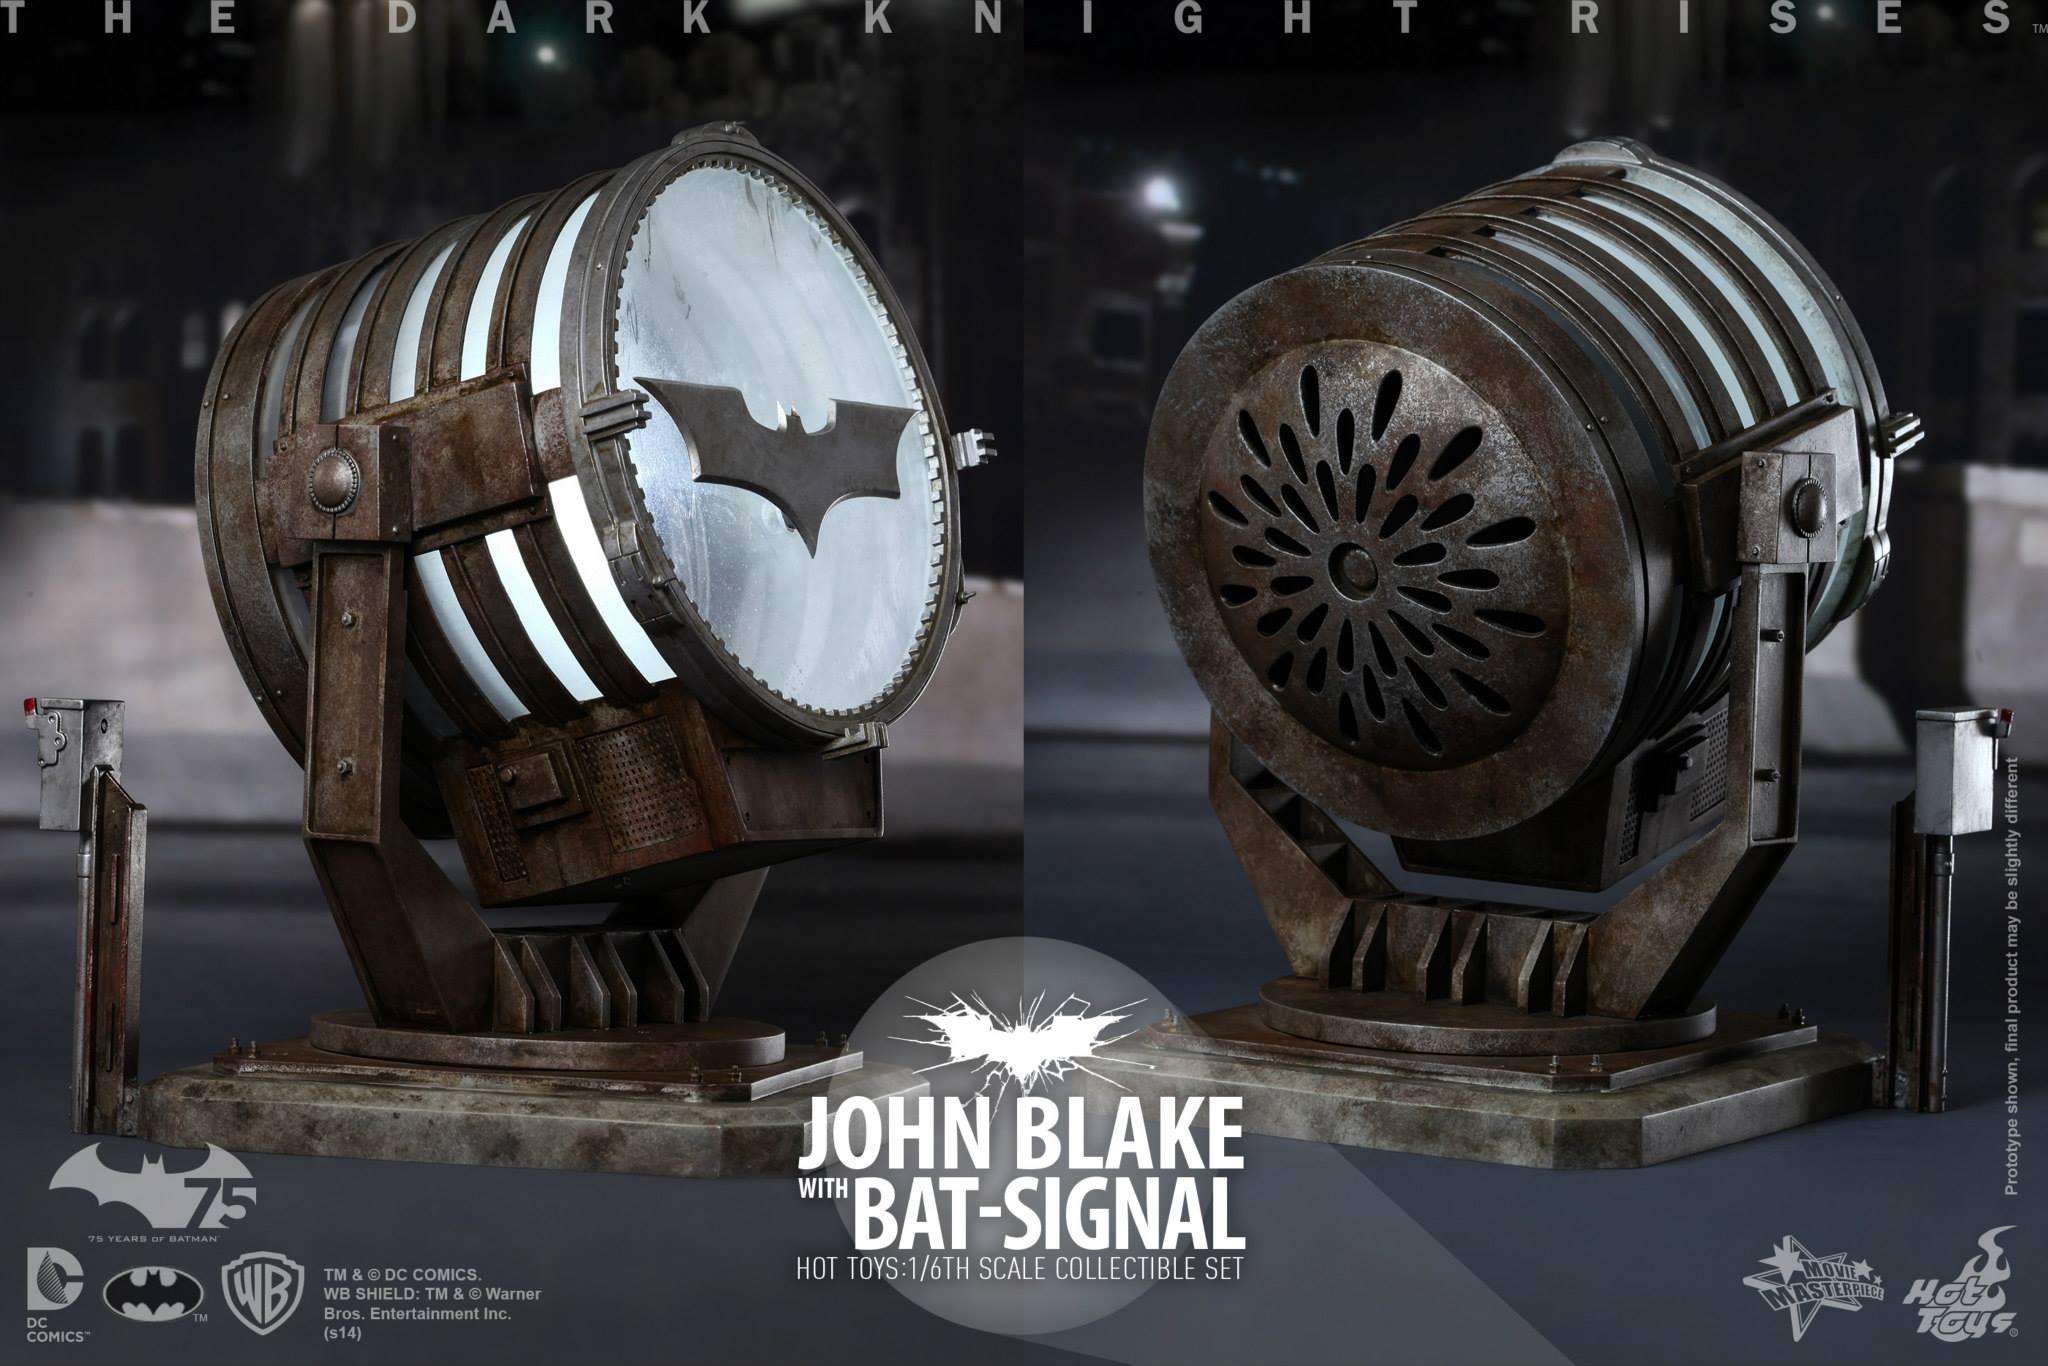 THE DARK KNIGHT RISES - Lt. JIM GORDON & JOHN BLAKE w/BATSIGNAL 556434108